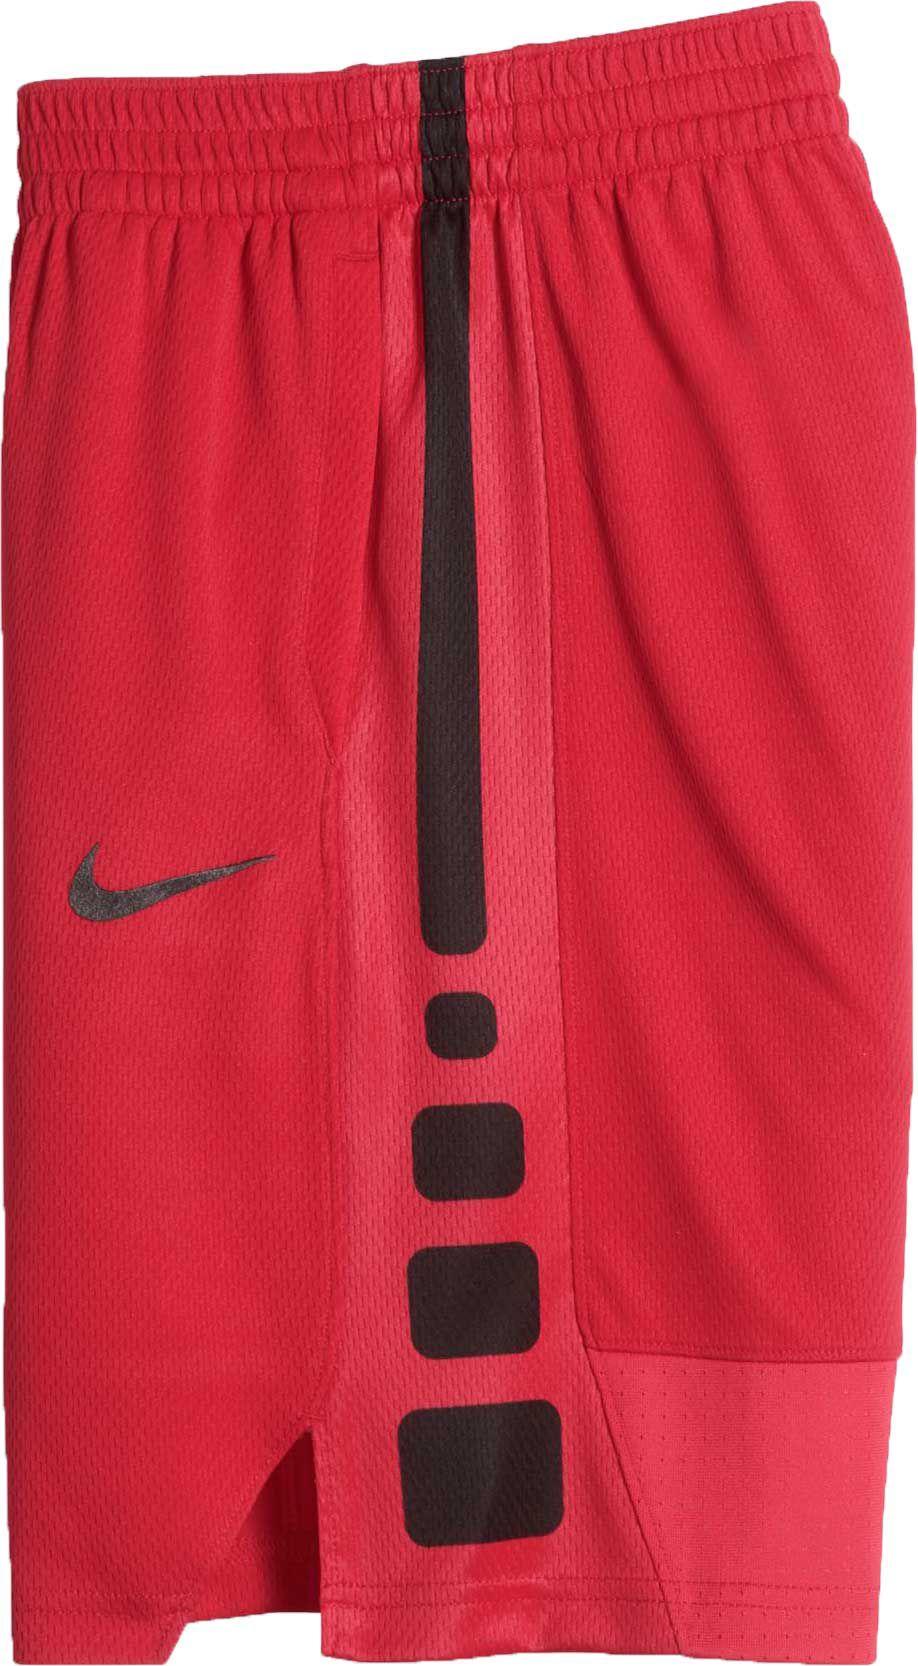 041b51362f94 Nike Boys  Dry Elite Stripe Basketball Shorts